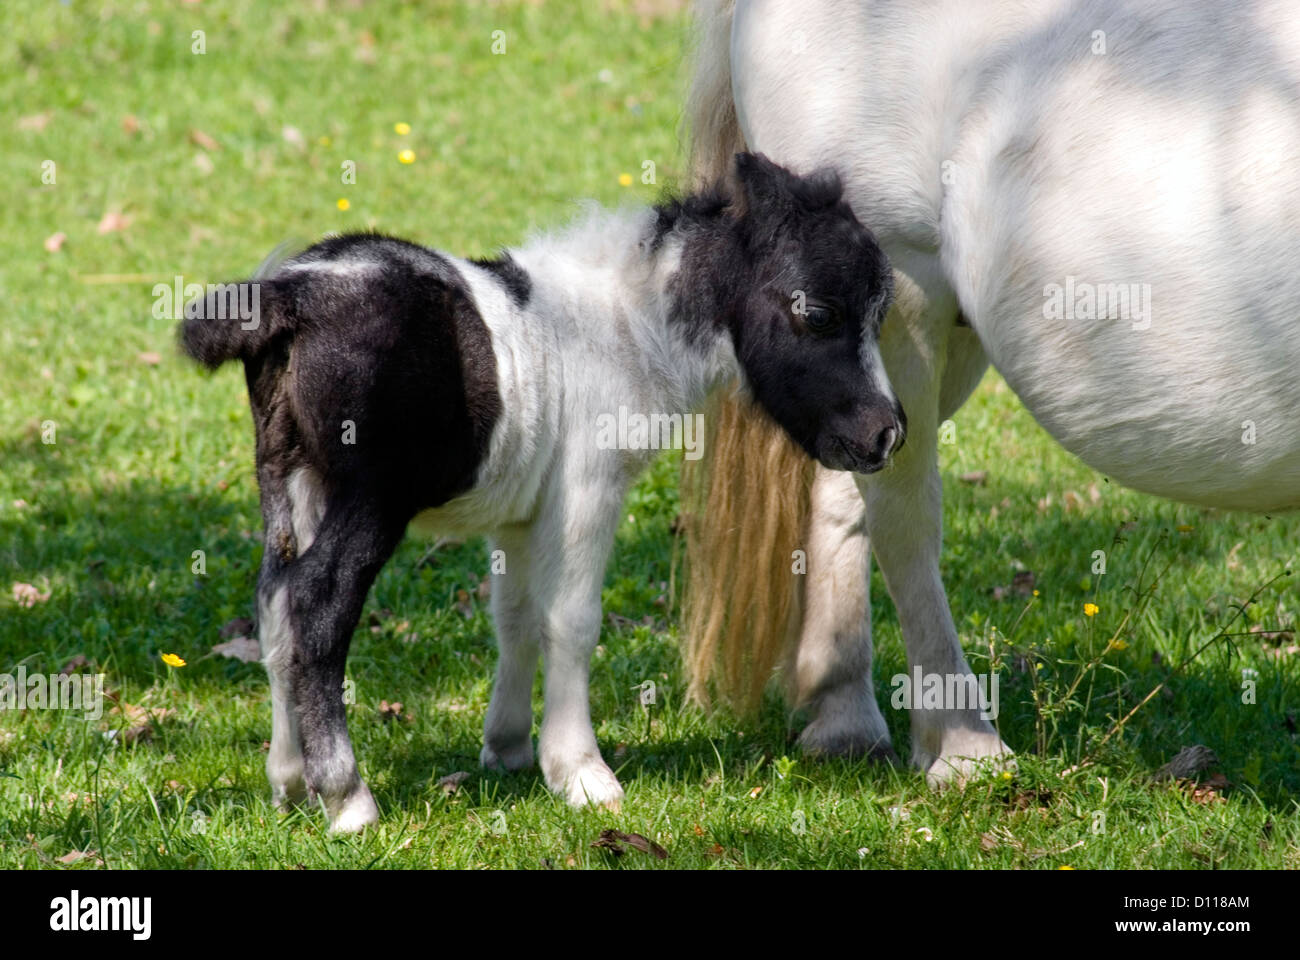 White Miniature horse foal standing on meadow | Miniaturpferd-Fohlen auf einer Weide Stock Photo